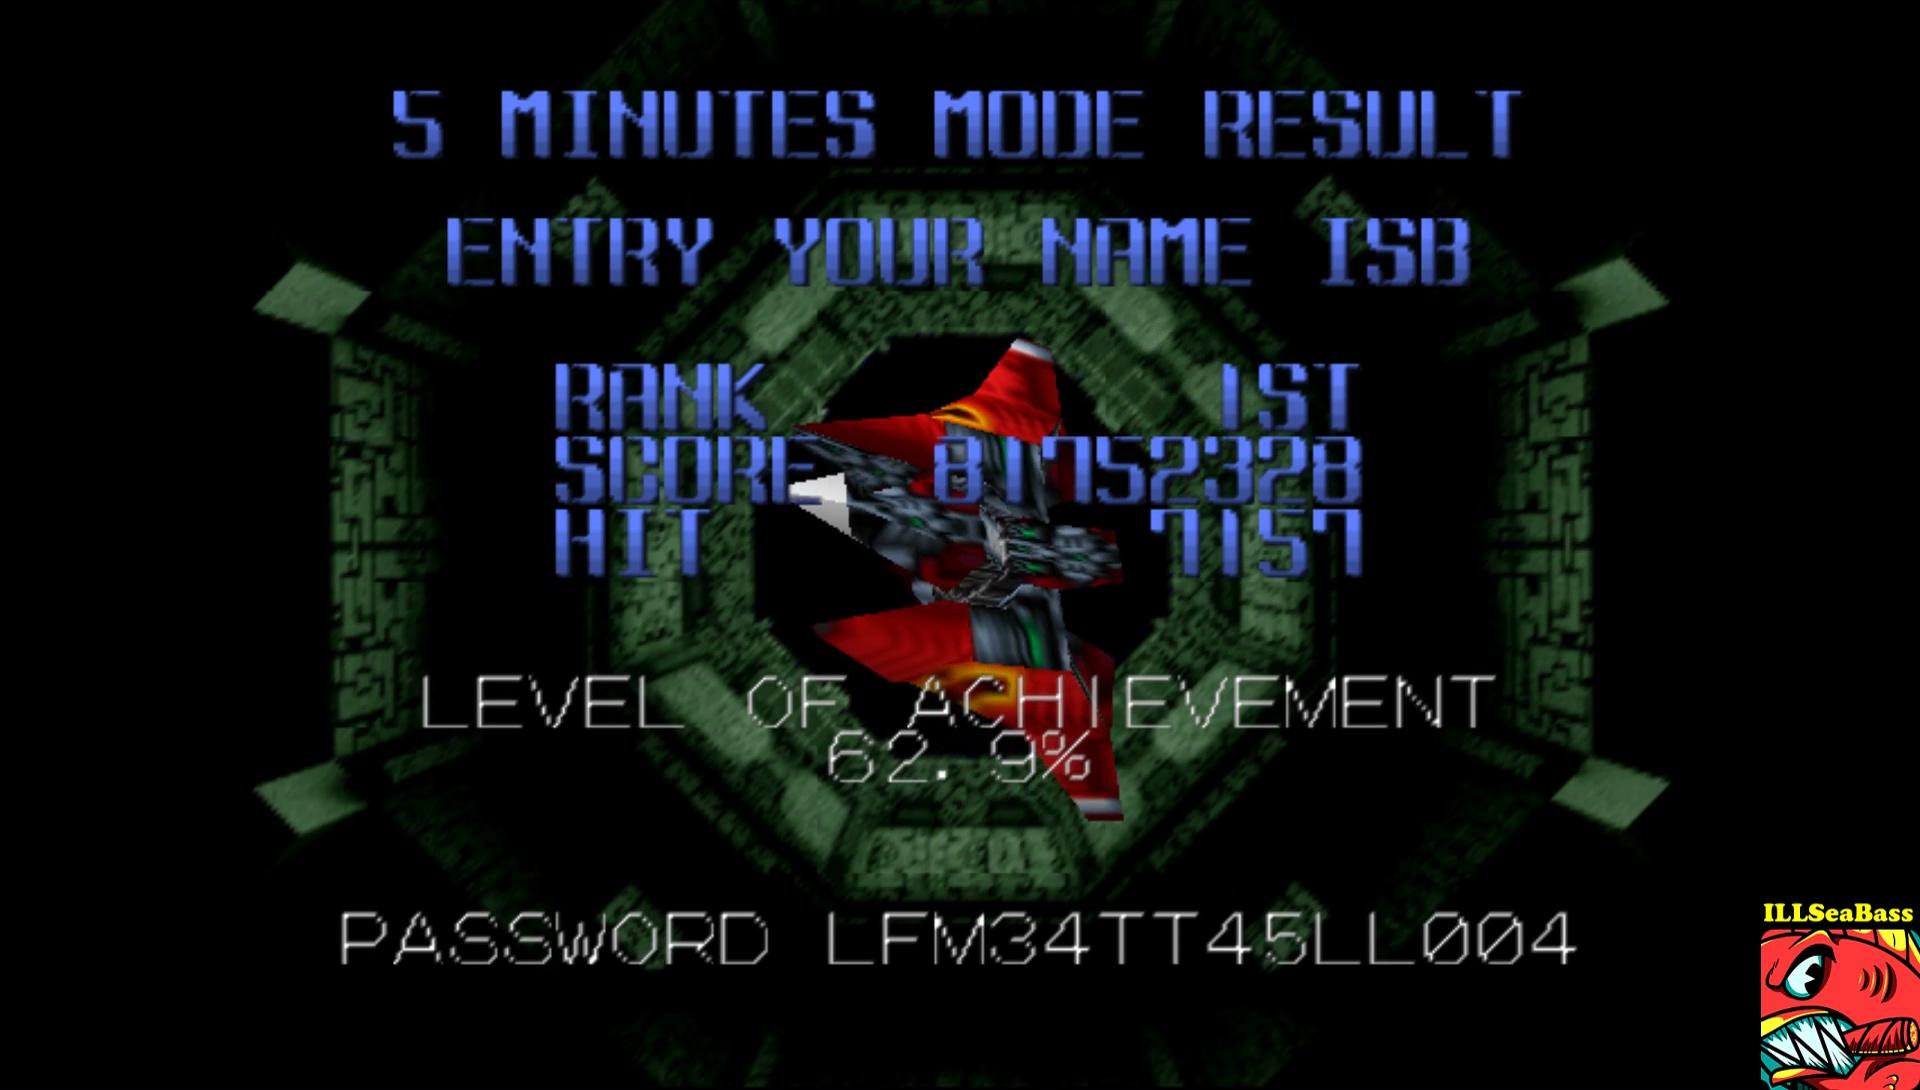 ILLSeaBass: Star Soldier Vanishing Earth: 5 Minutes Mode [Regular] (N64 Emulated) 81,752,328 points on 2017-04-13 20:23:40